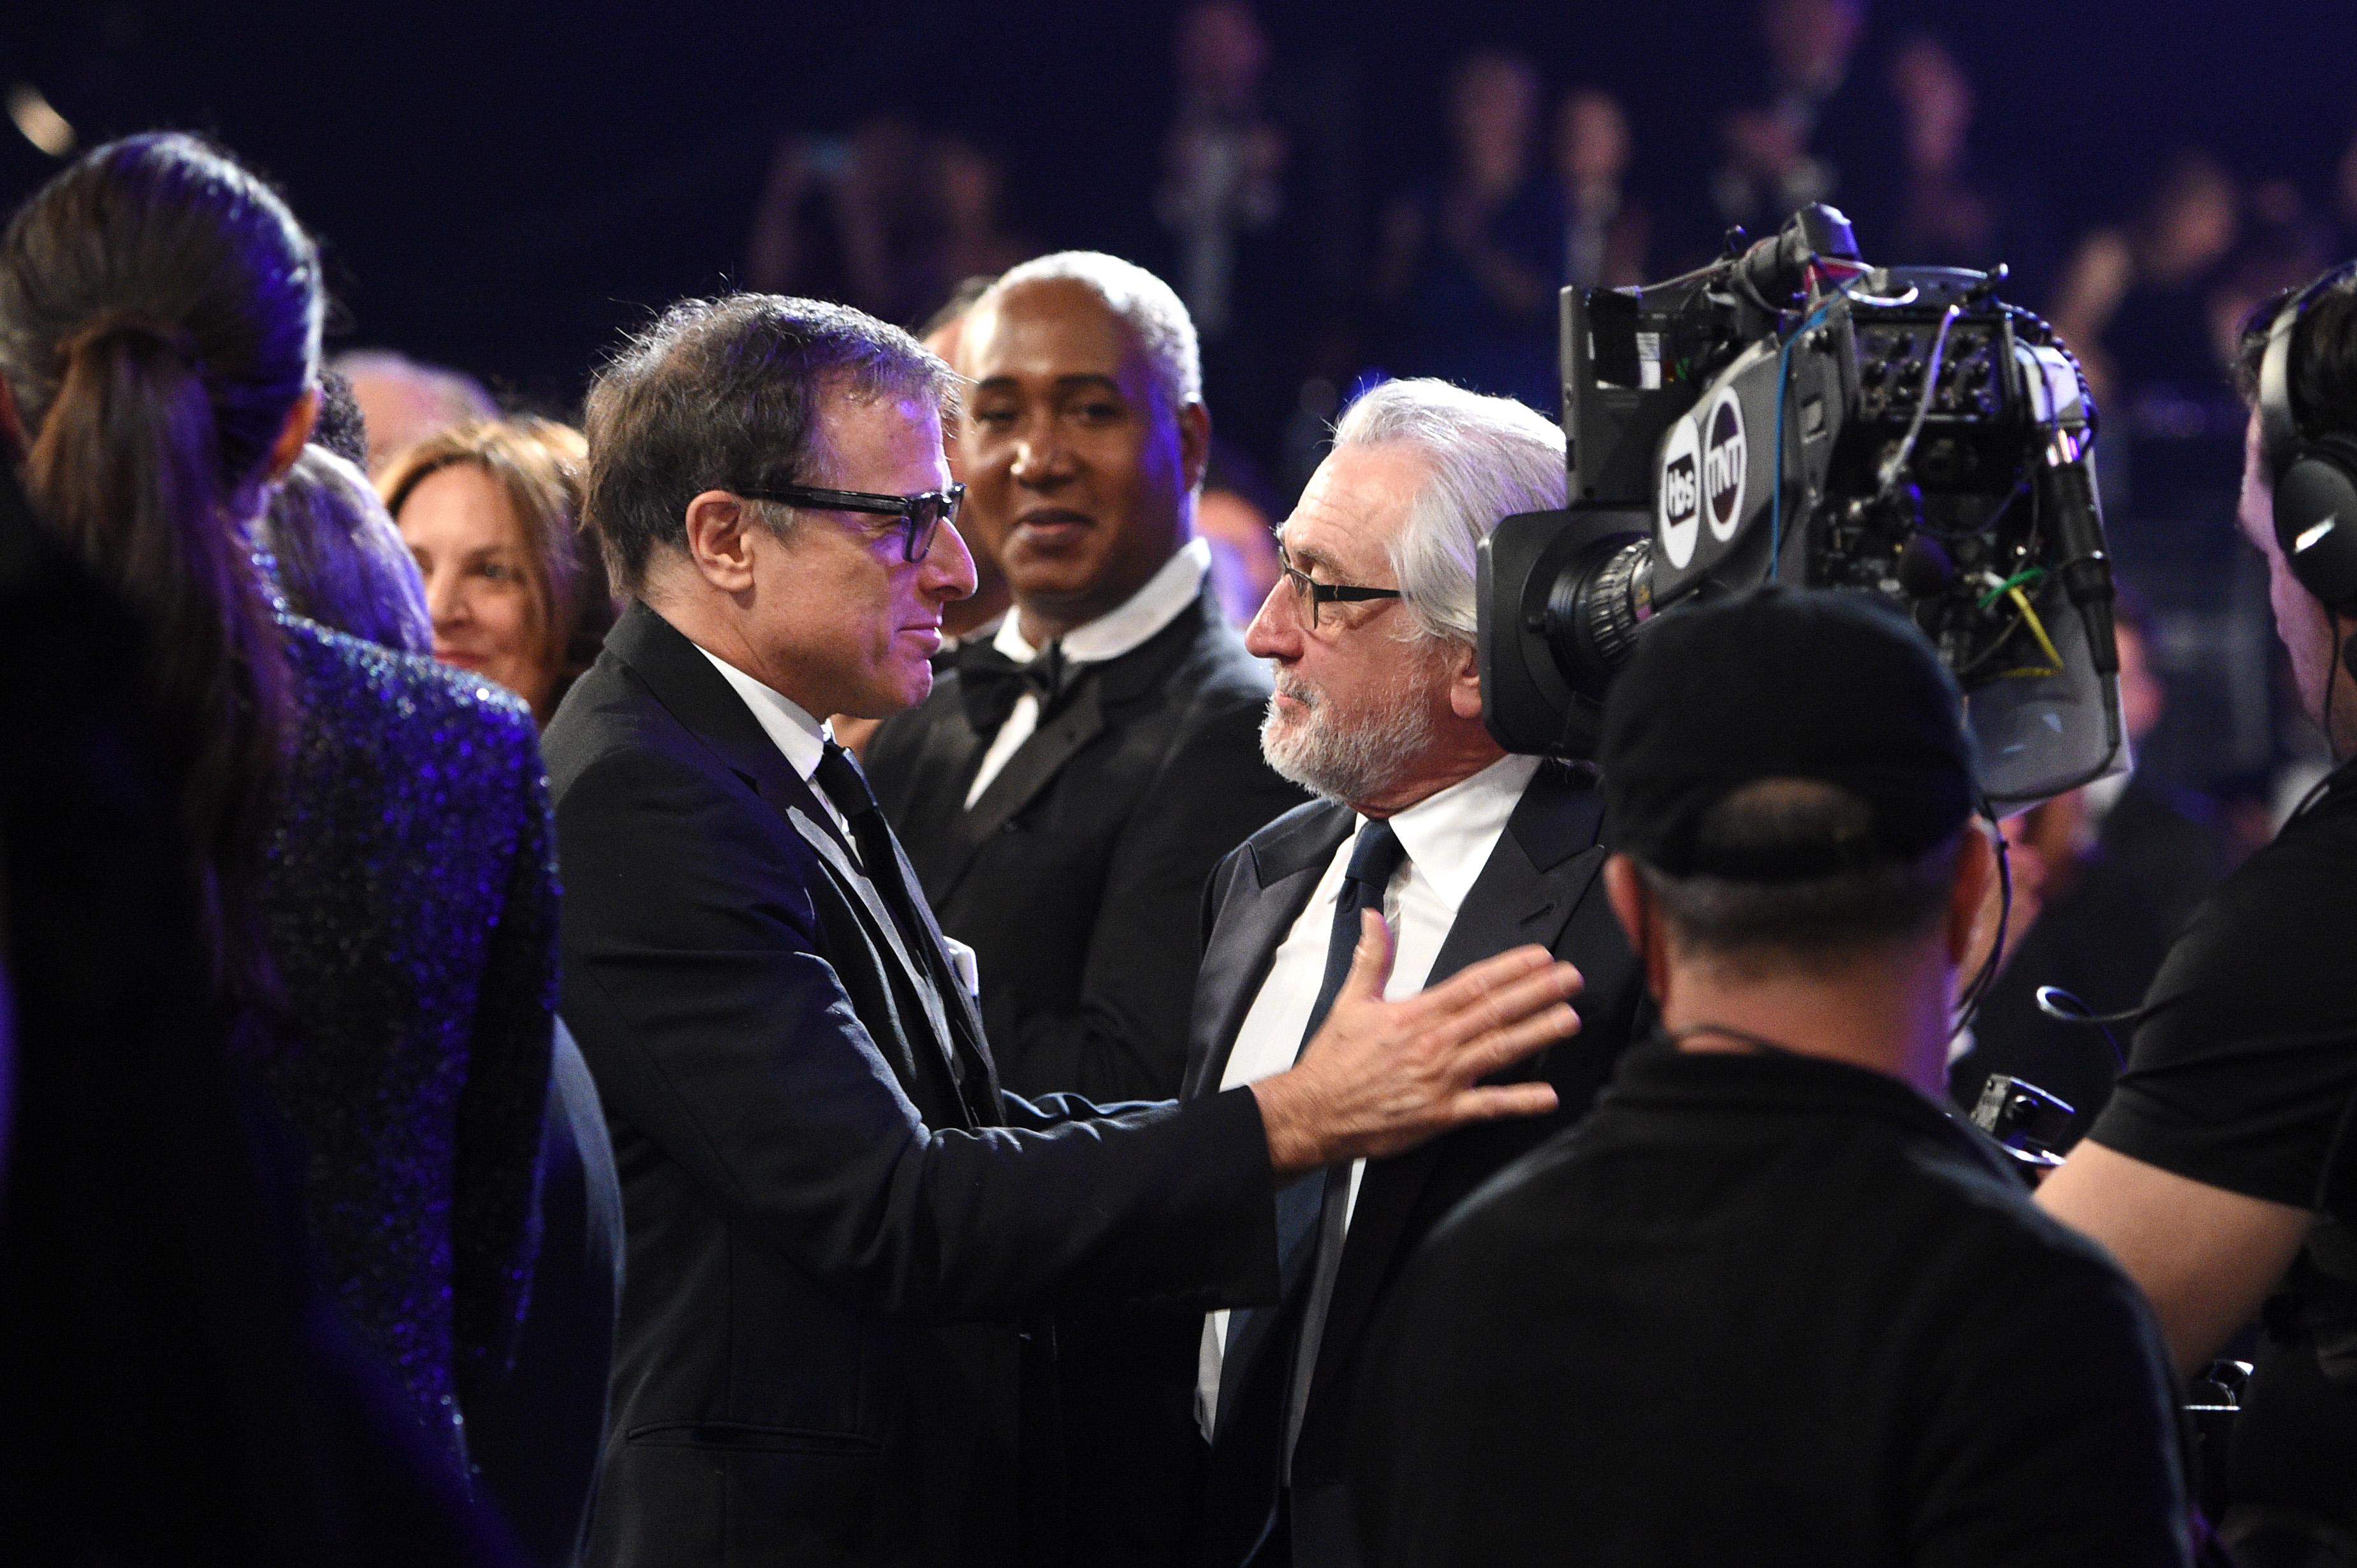 Robert De Niro and David O. Russell